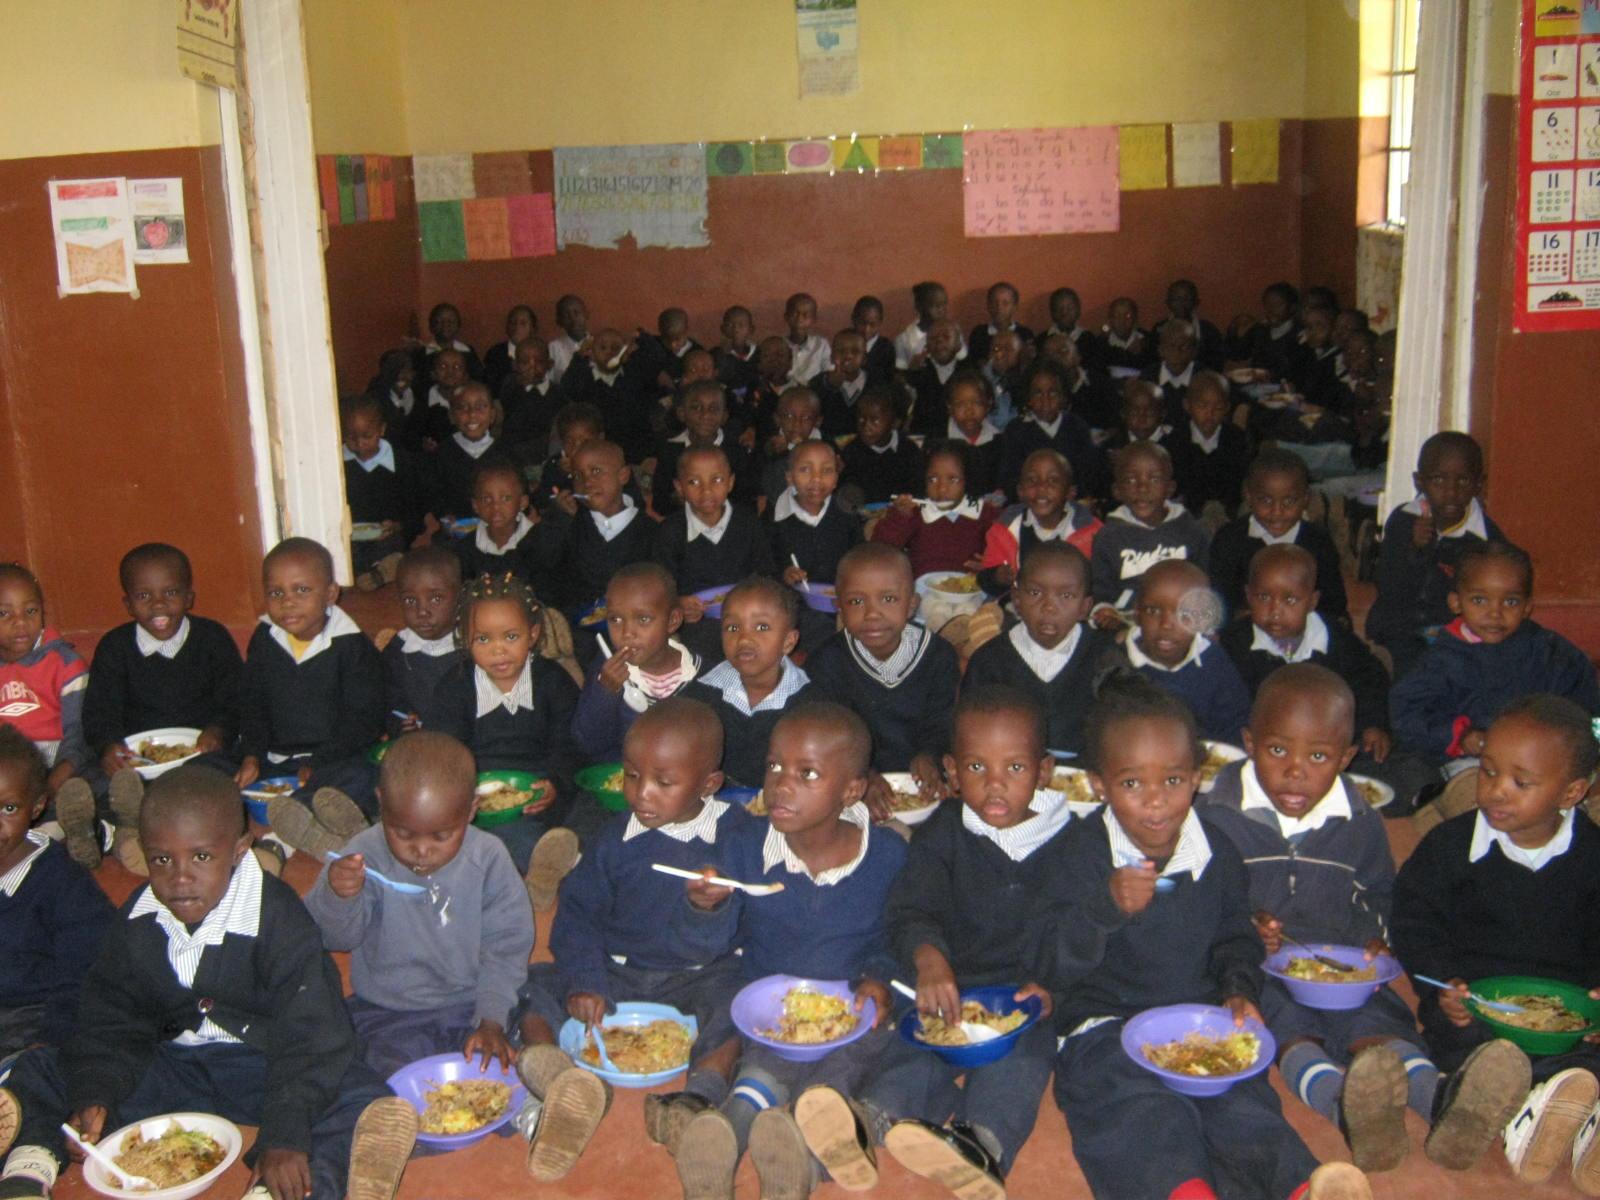 Children enjoy the wonderful meal